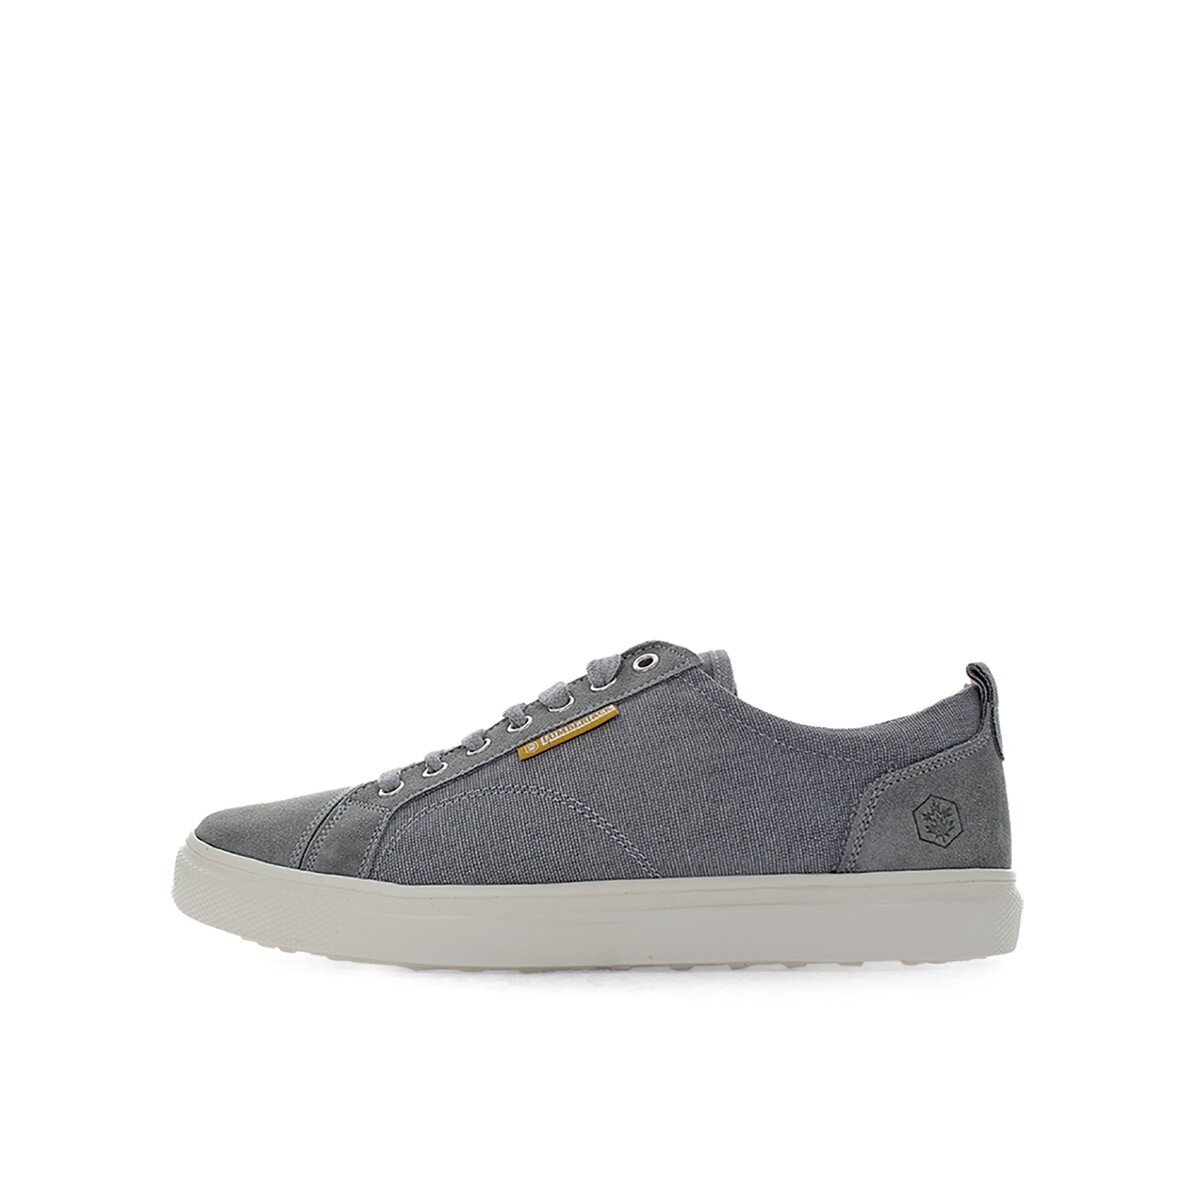 BRANSON Sneakers Uomo